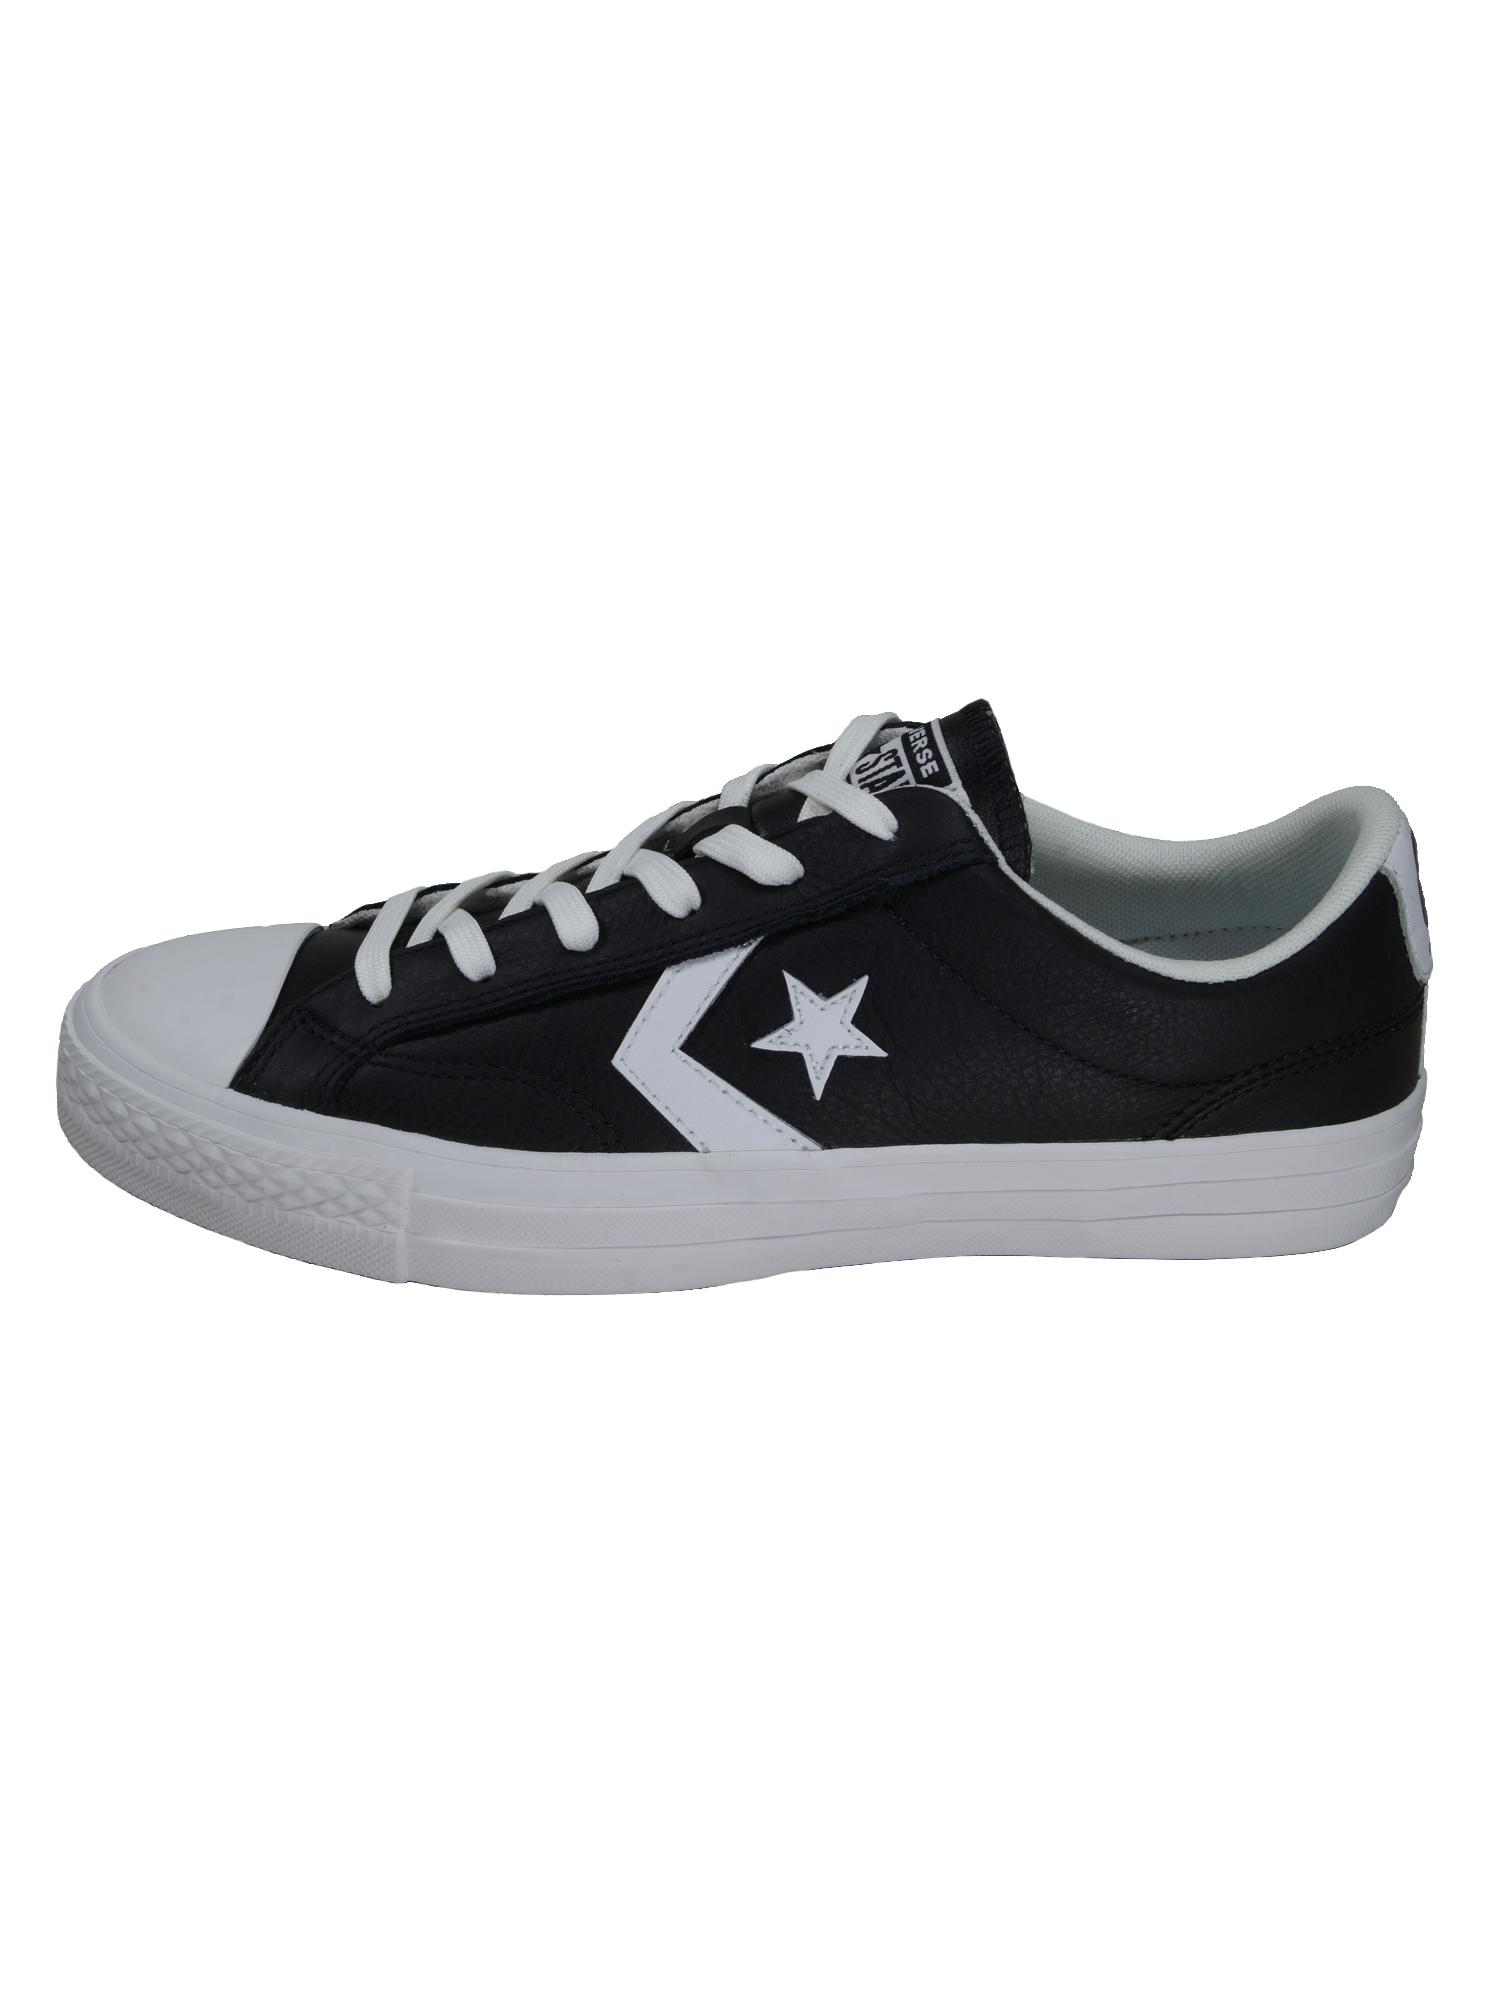 Converse Herren Schuhe Star Player Ox Schwarz Glattleder Sneakers 41 ...